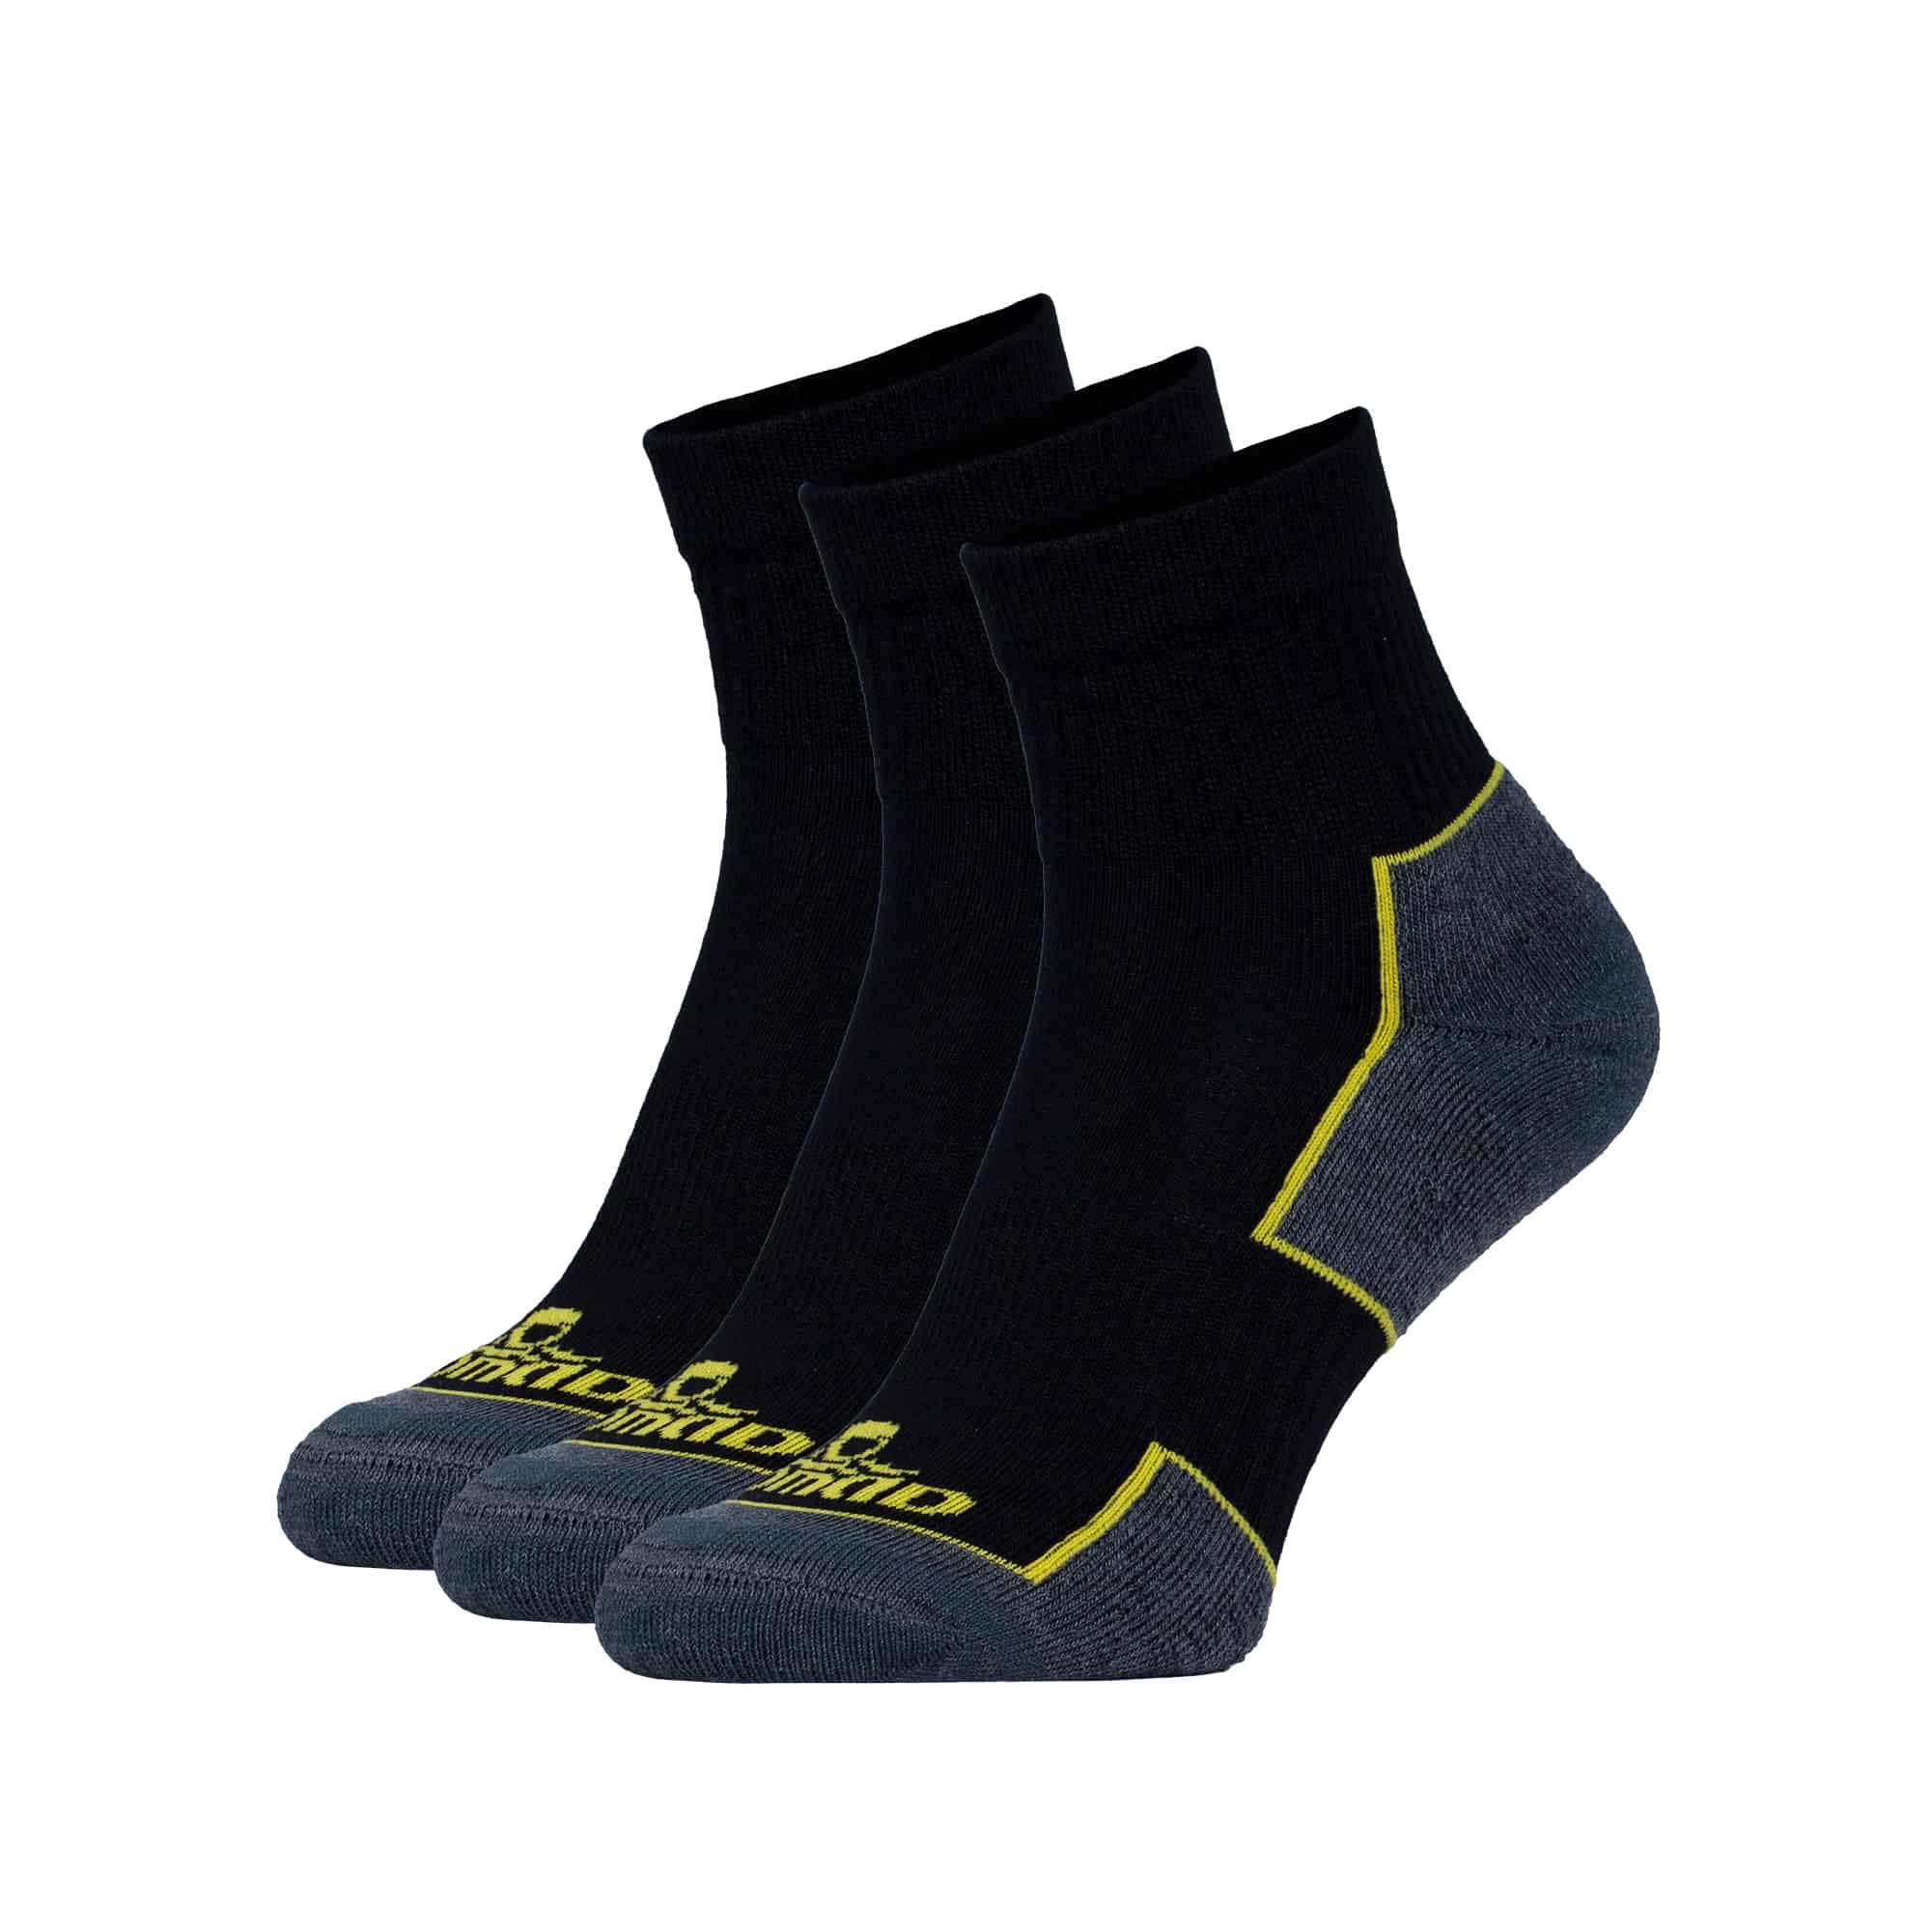 124 black/yellow